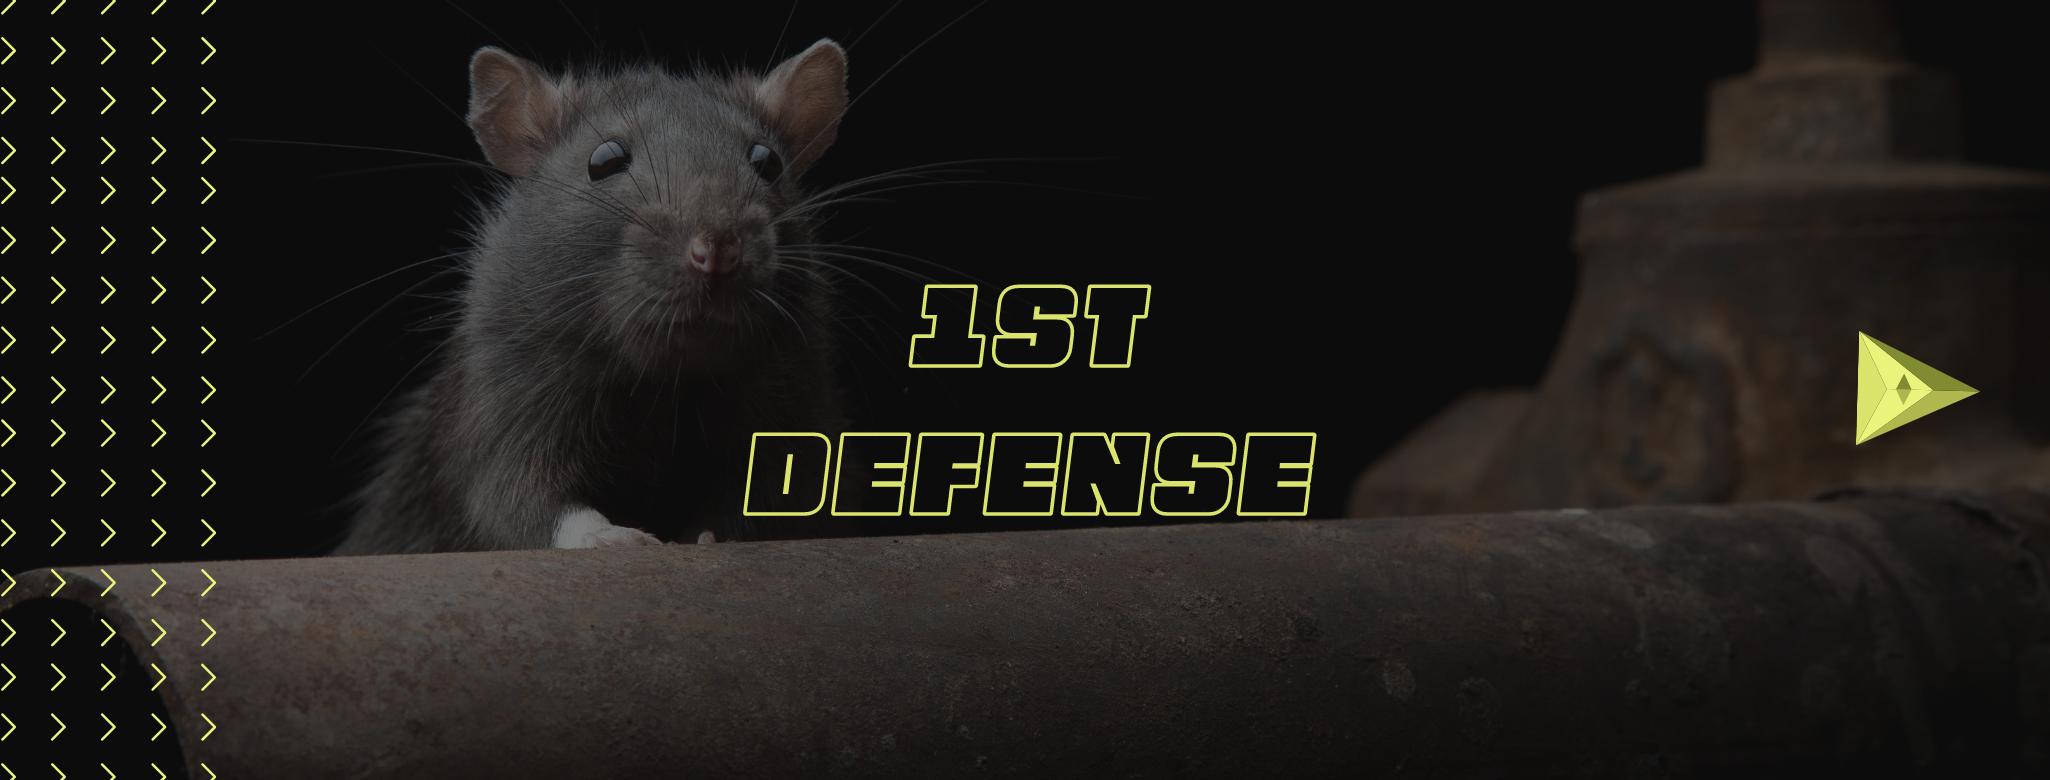 1st defense banner